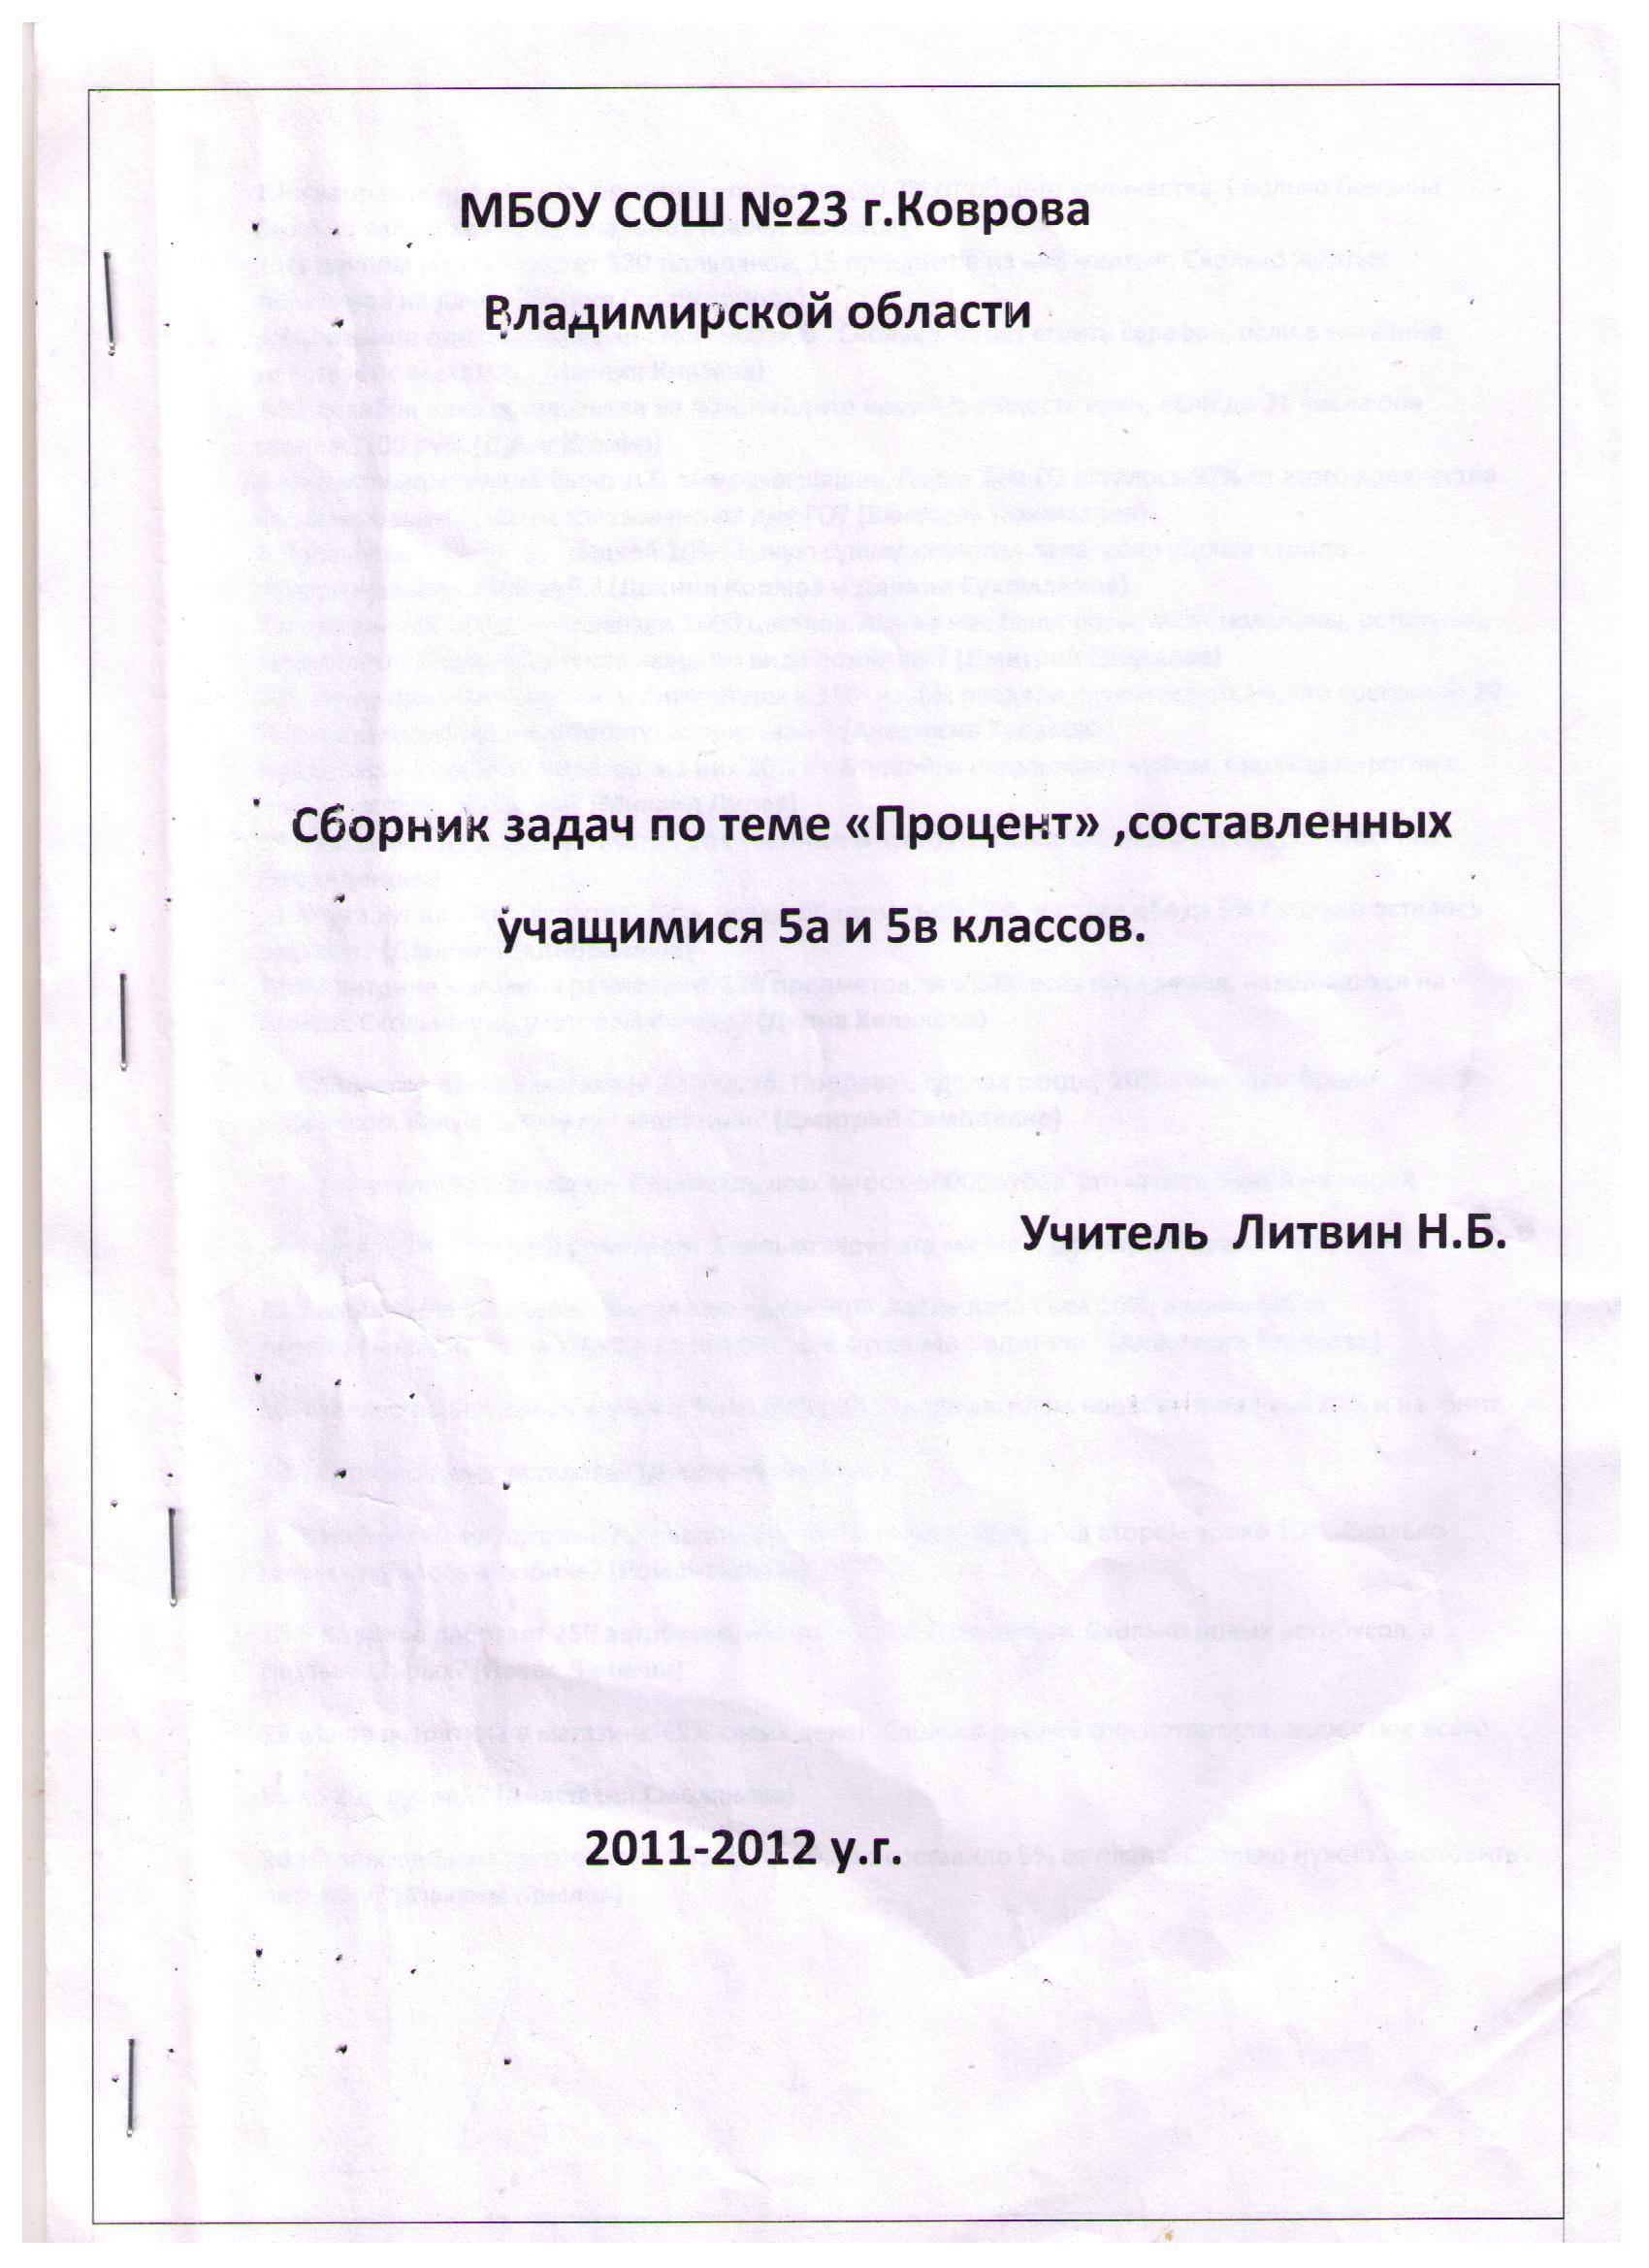 C:\Users\Настя\Pictures\2014-09-22\001.jpg